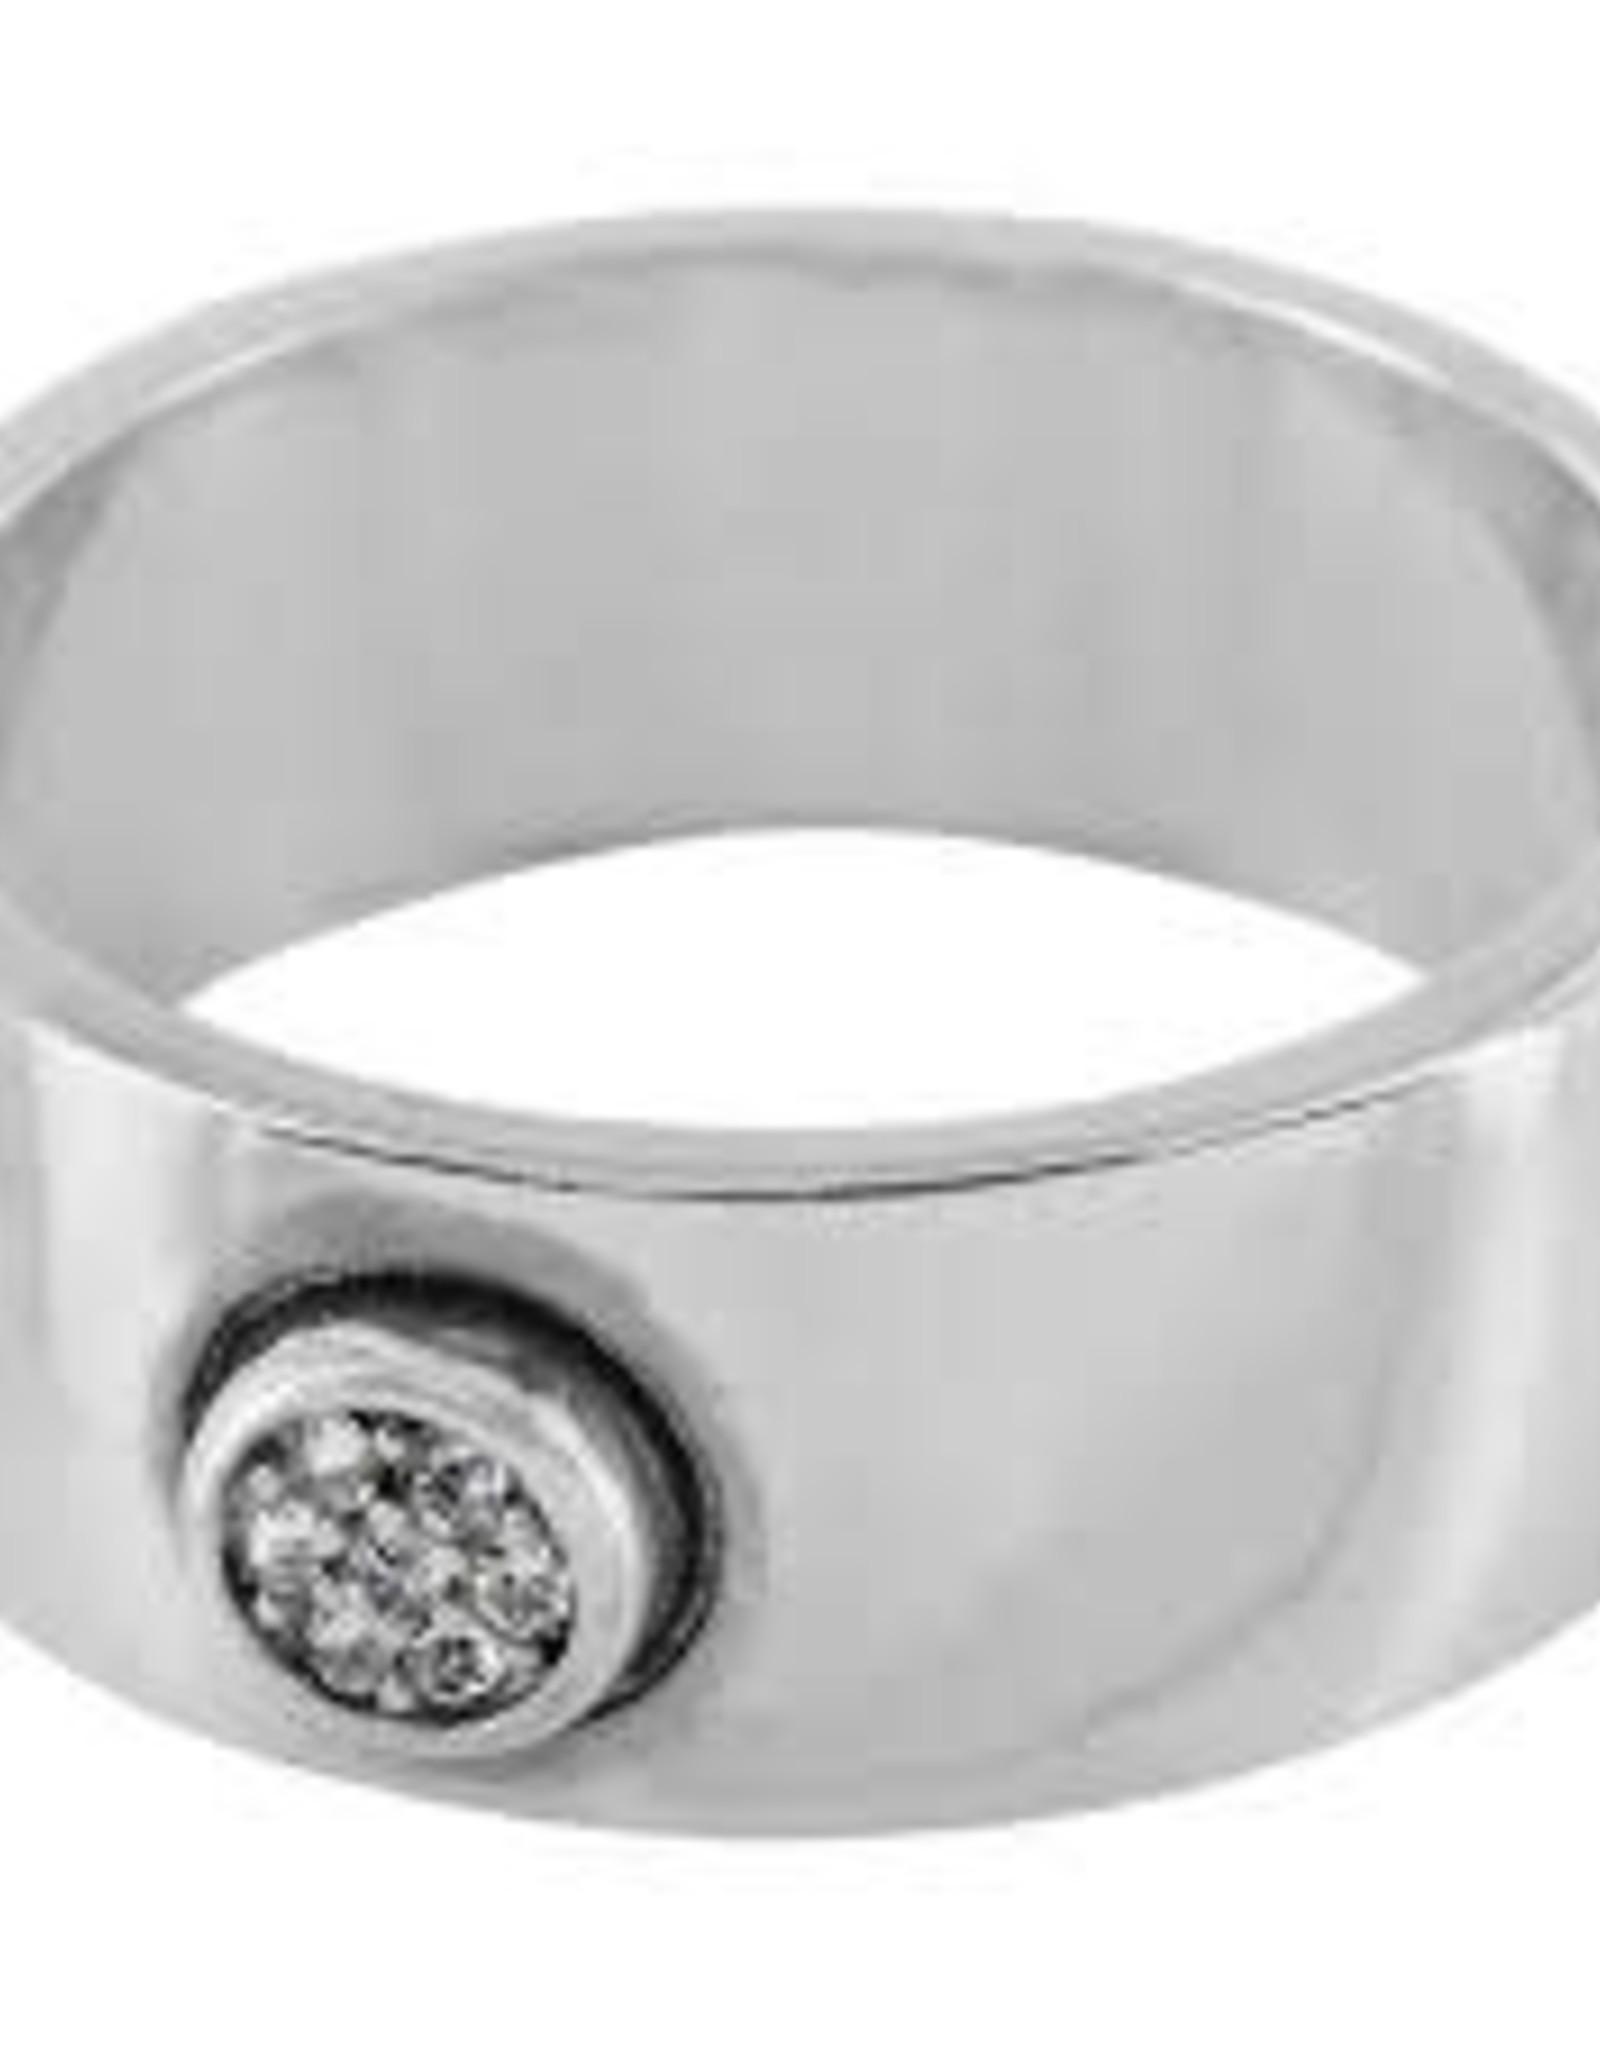 Brighton Brighto Ring Meridian Petite Sparkle  Sz 6